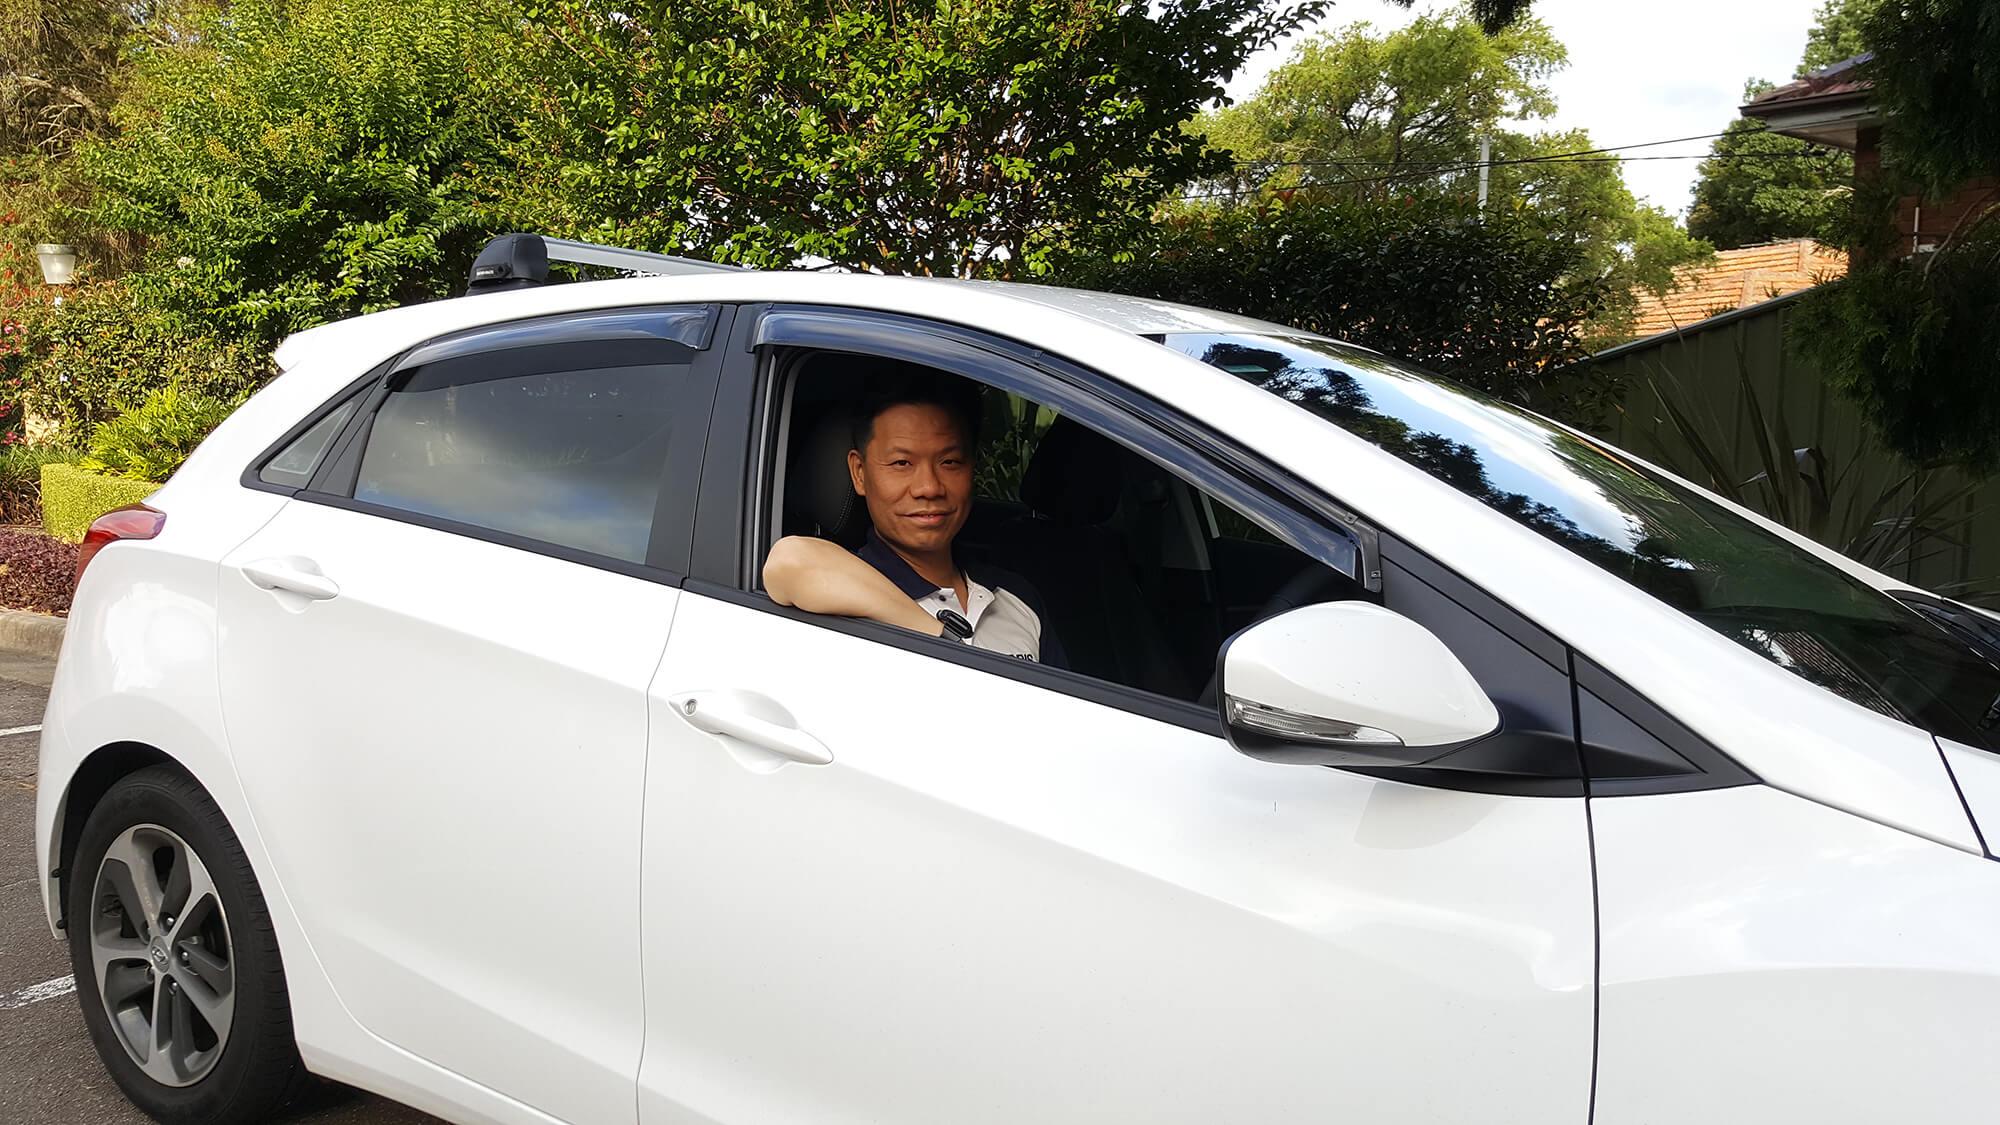 Driving Instructor Rockdale inside car Dannyl